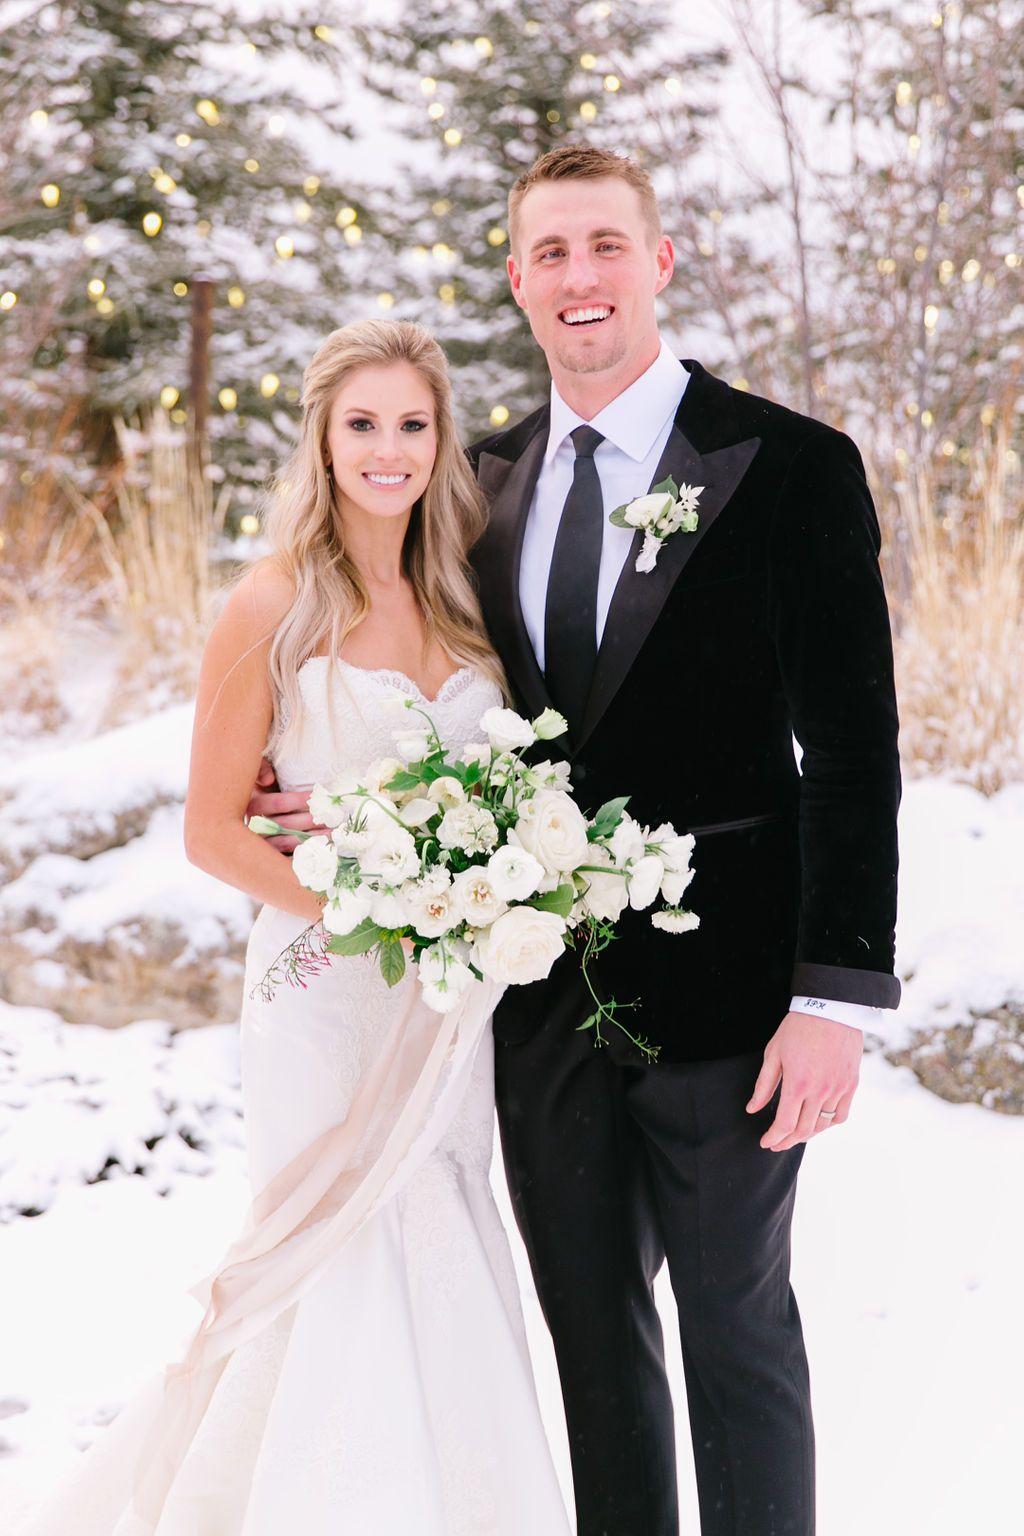 Hannah + Jeff's Wintry Spruce Mountain Ranch Wedding